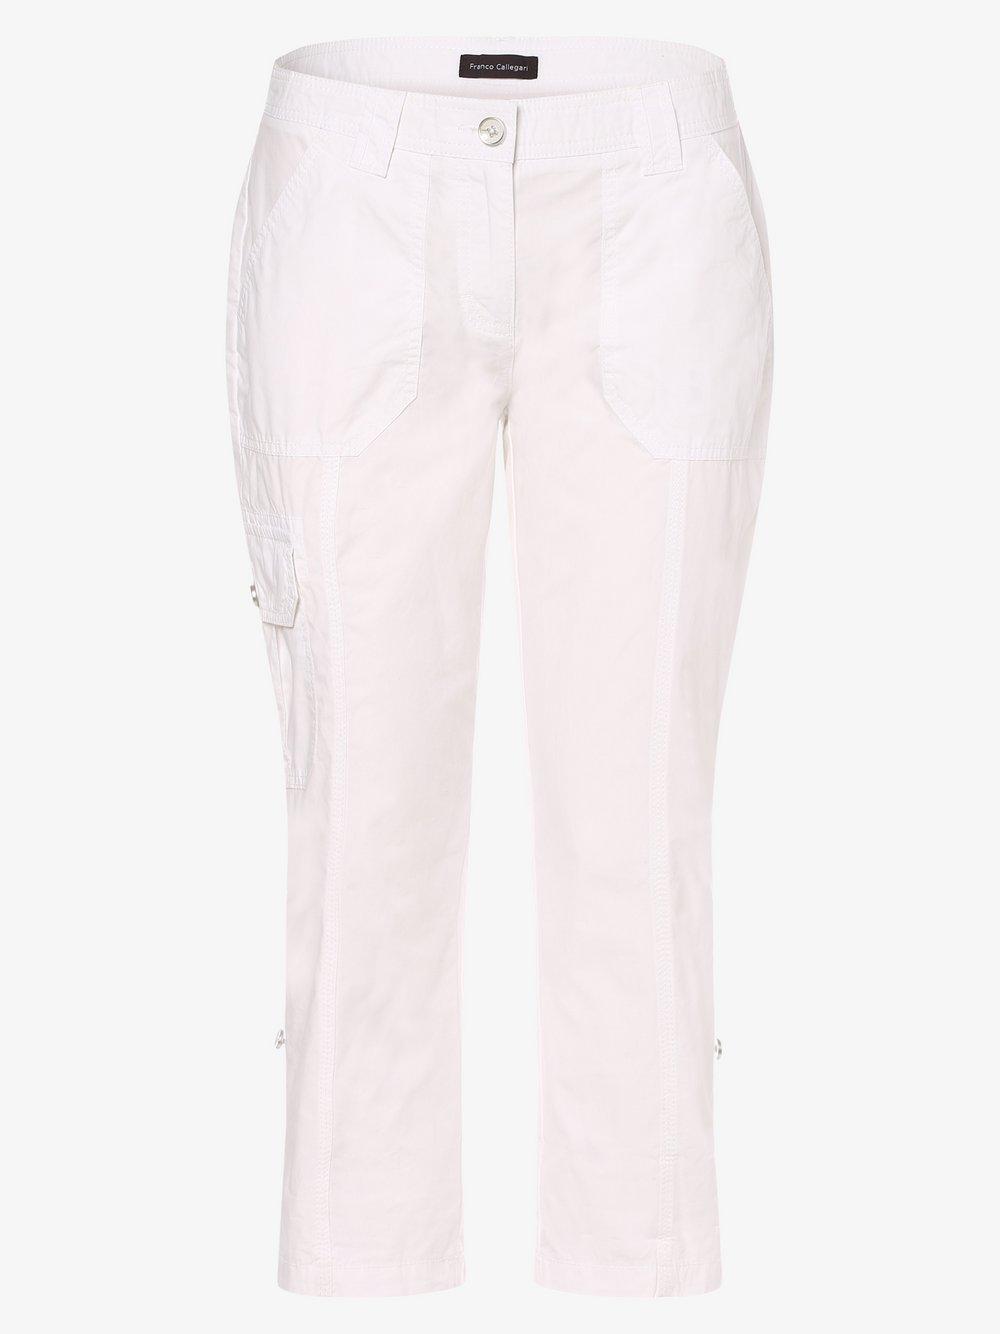 Franco Callegari - Spodnie damskie, biały